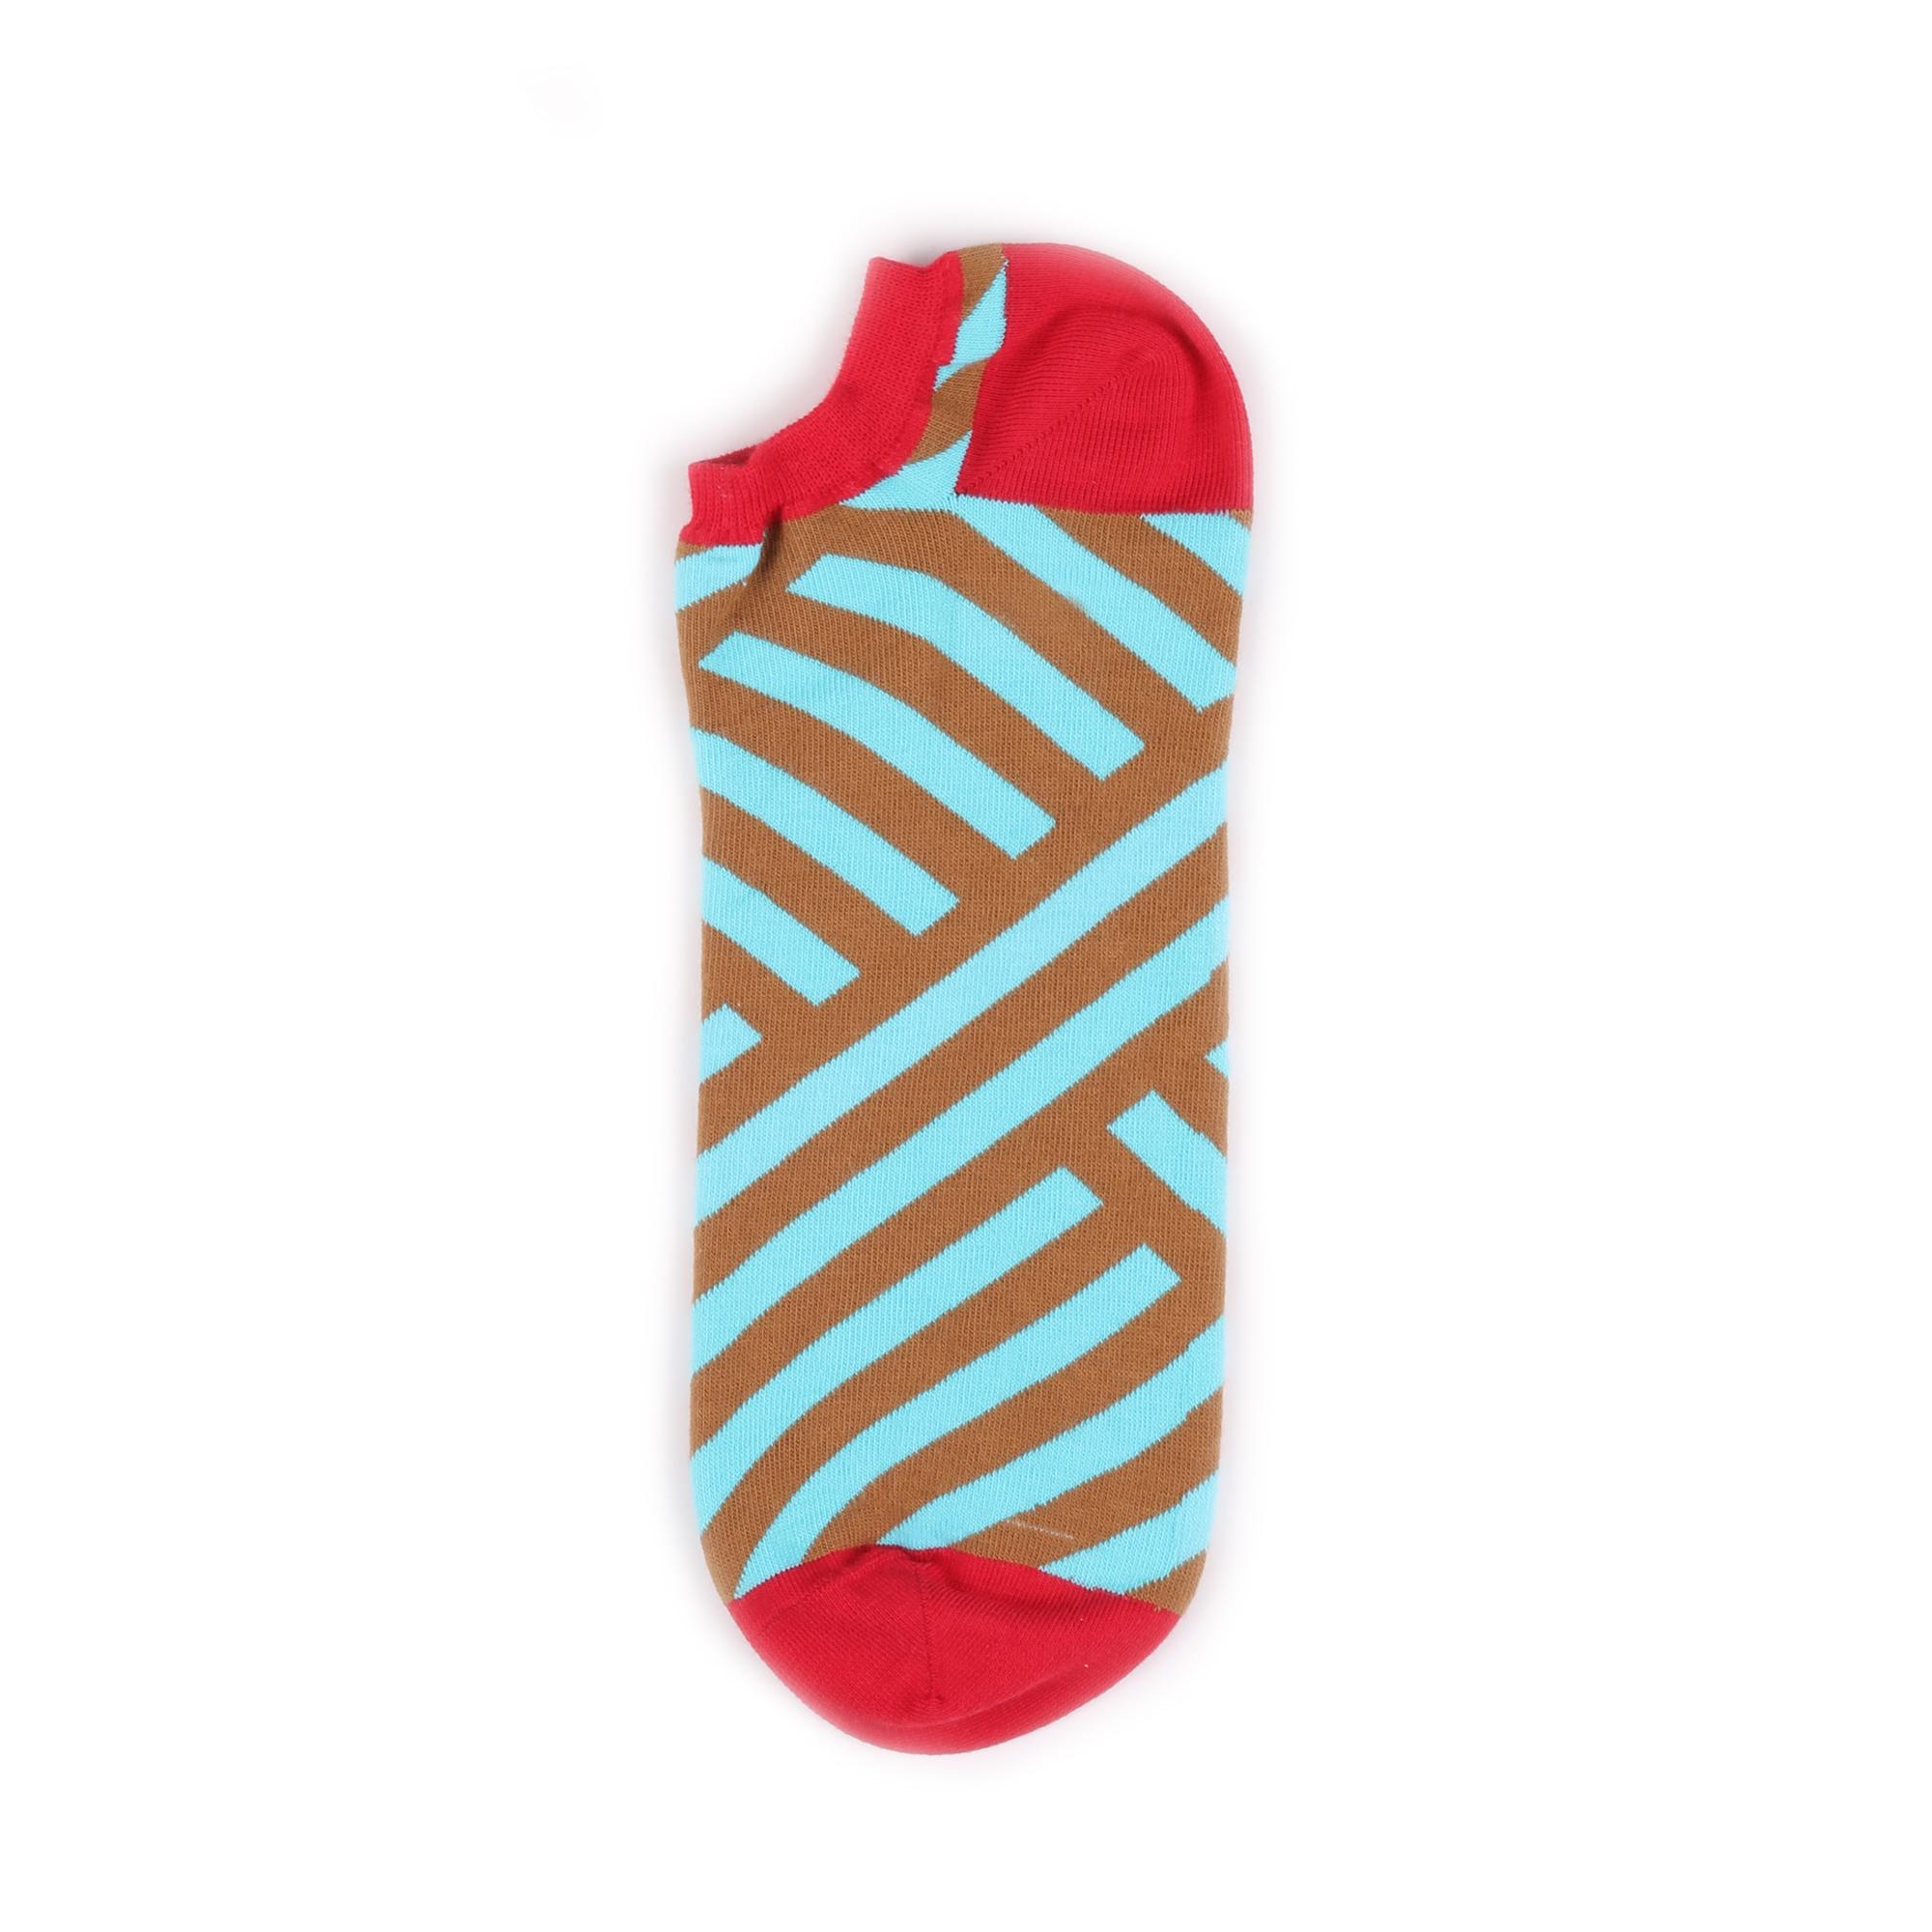 Носки унисекс Burning heels BHAnkleStripe_Brown_Blue голубые 36-38 RU